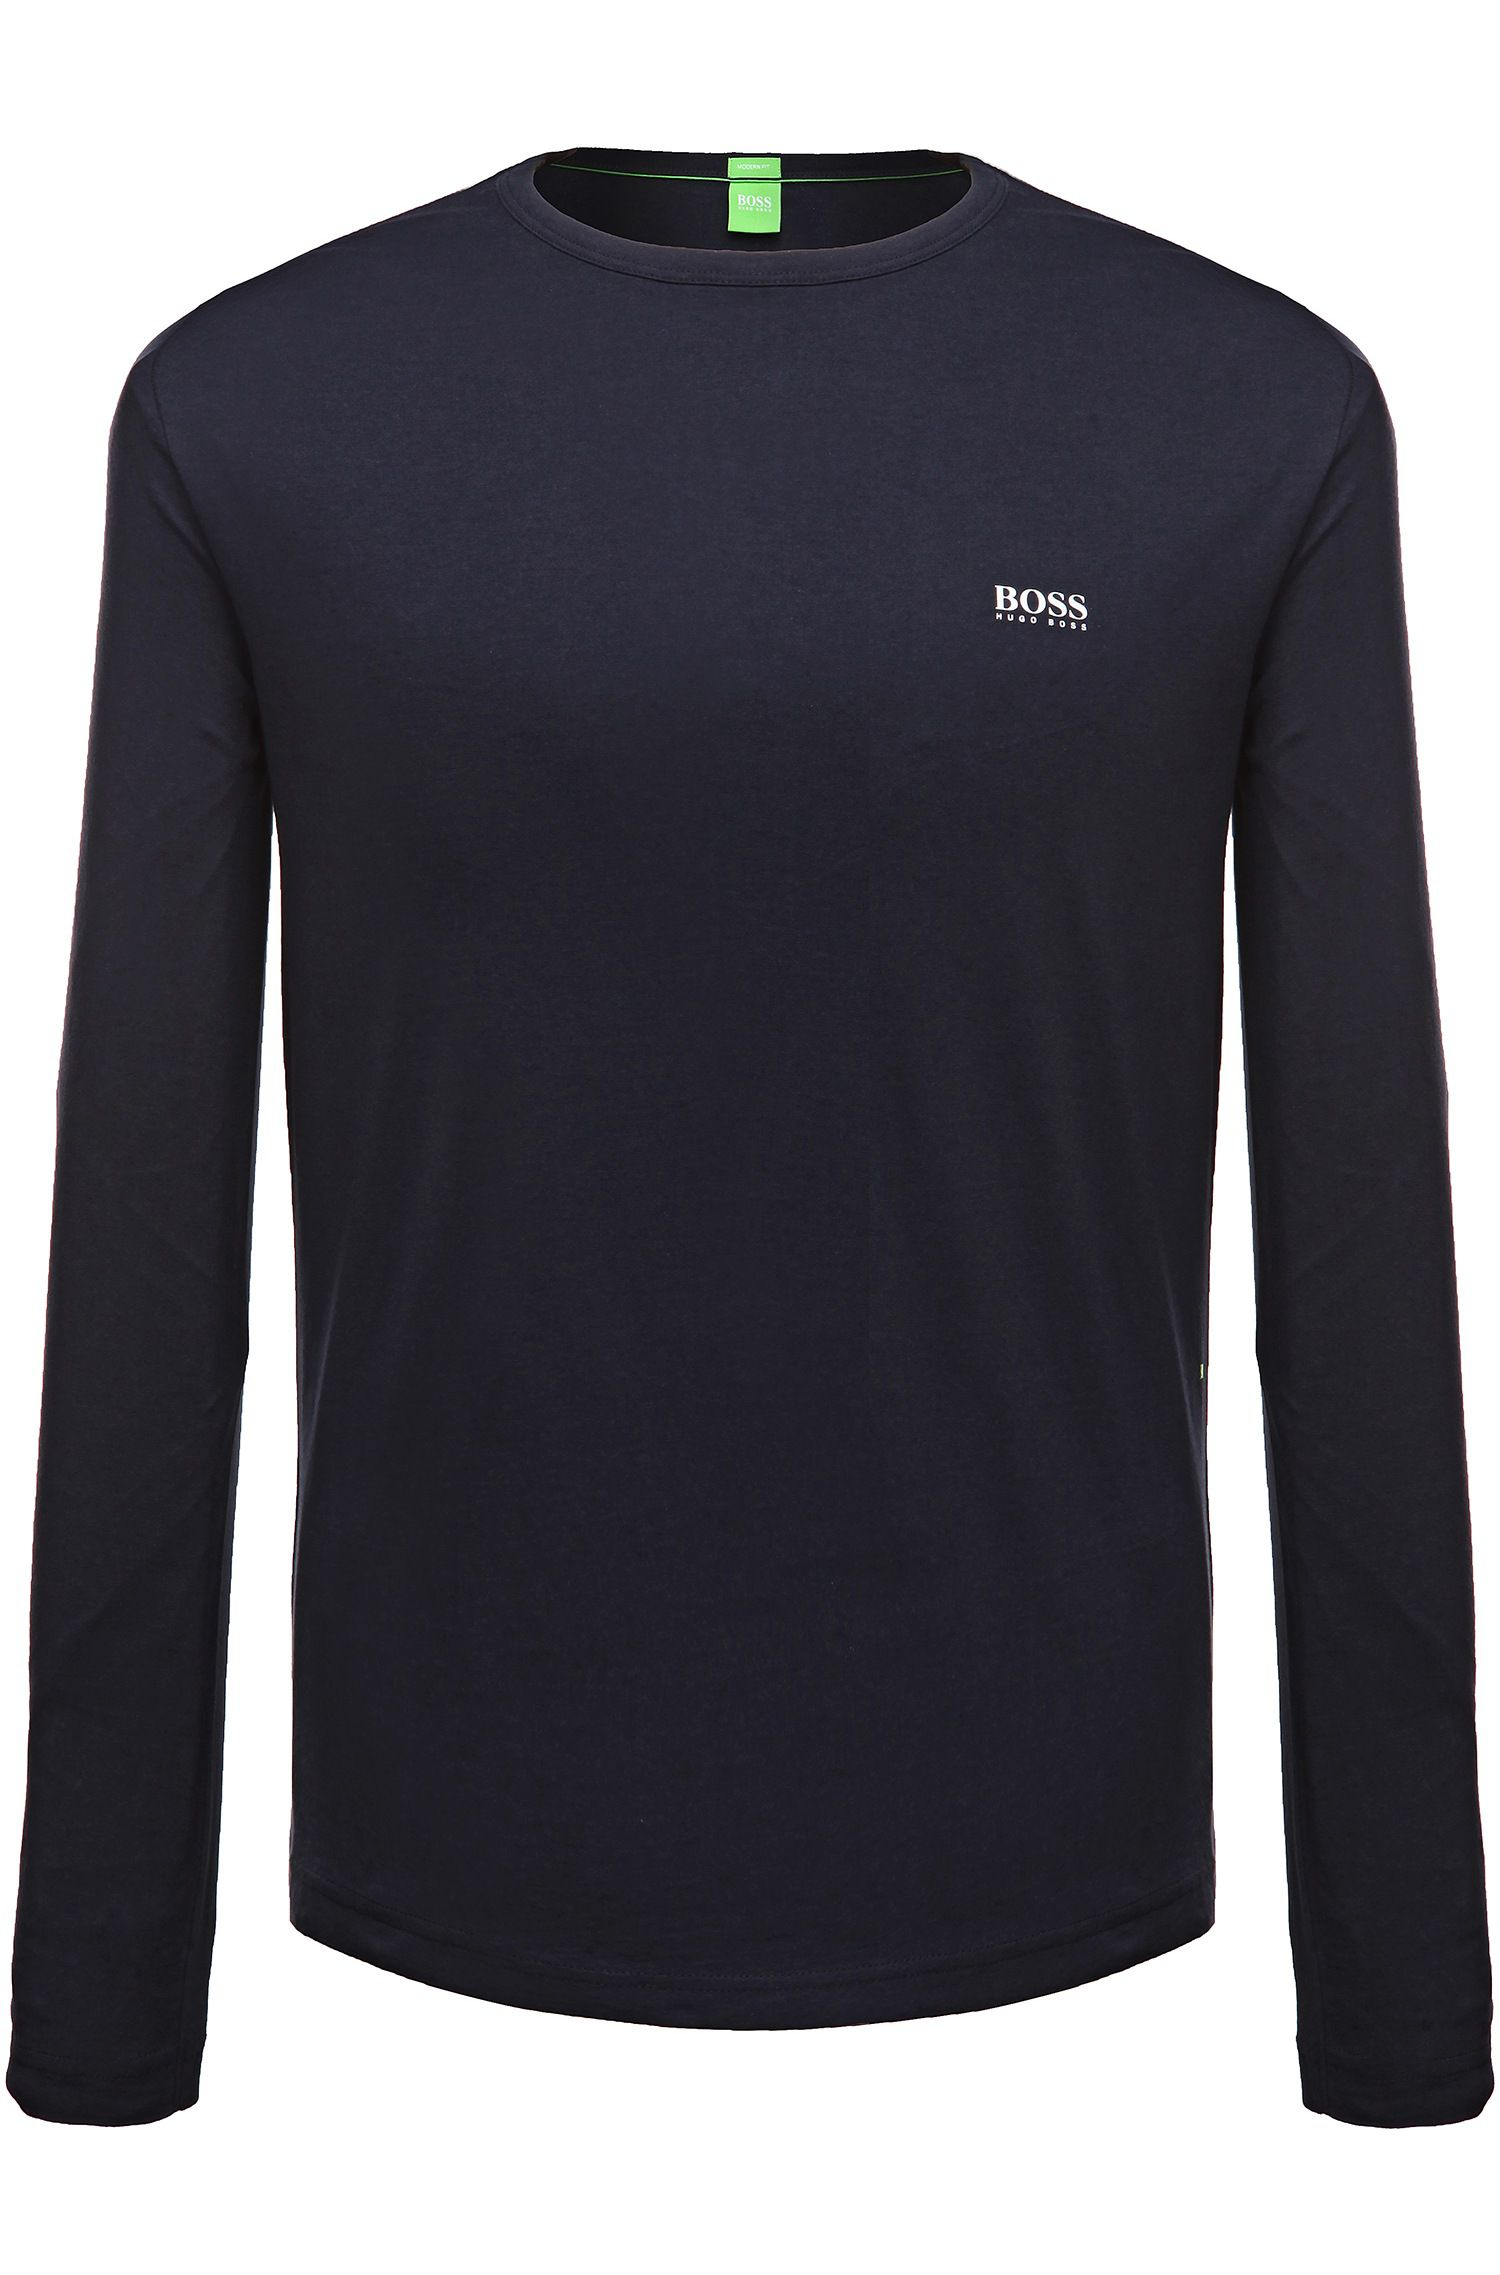 Cotton Long Sleeve T-Shirt | Togn